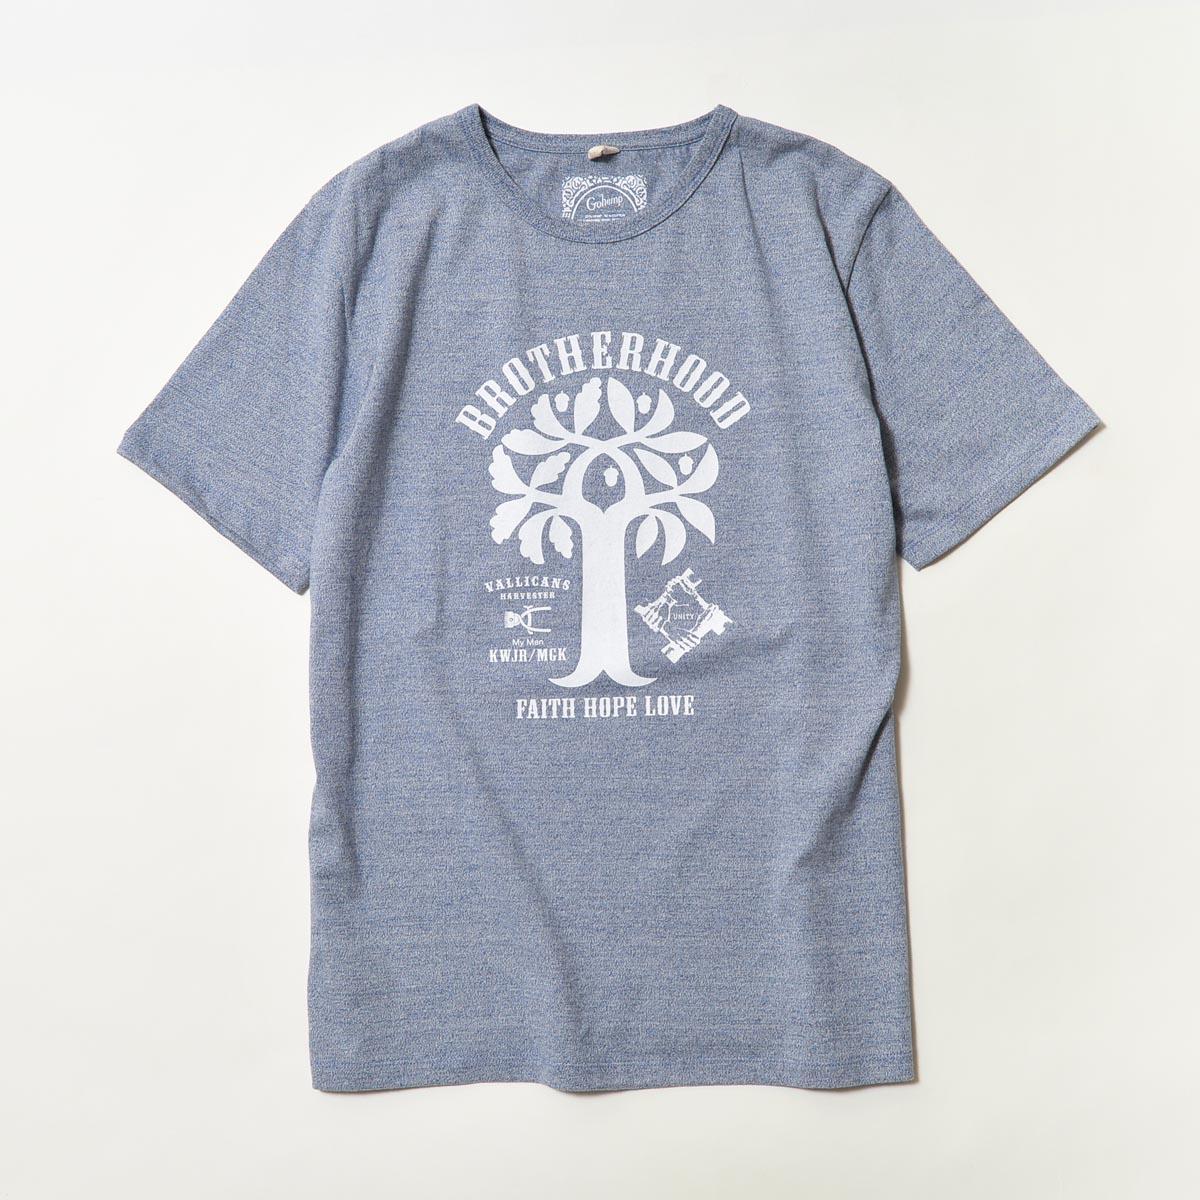 BROTHERHOOD Tシャツ_a0152253_15571341.jpg